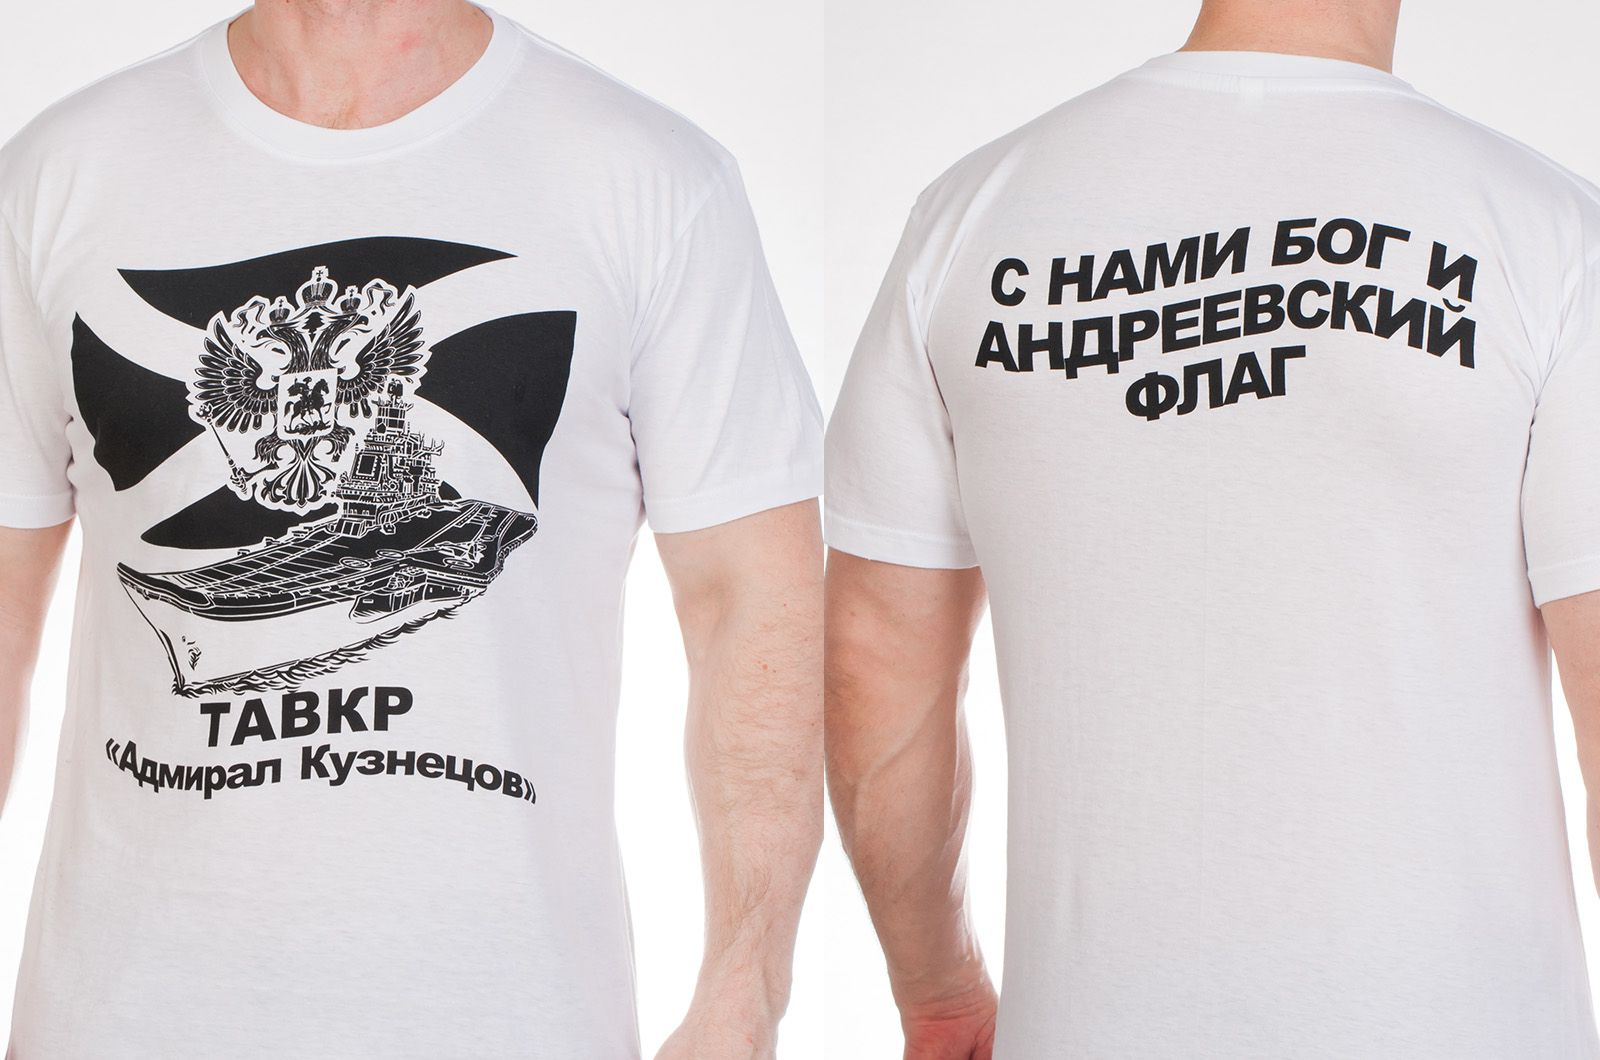 Заказать футболки ТАВКР «Адмирал Кузнецов»